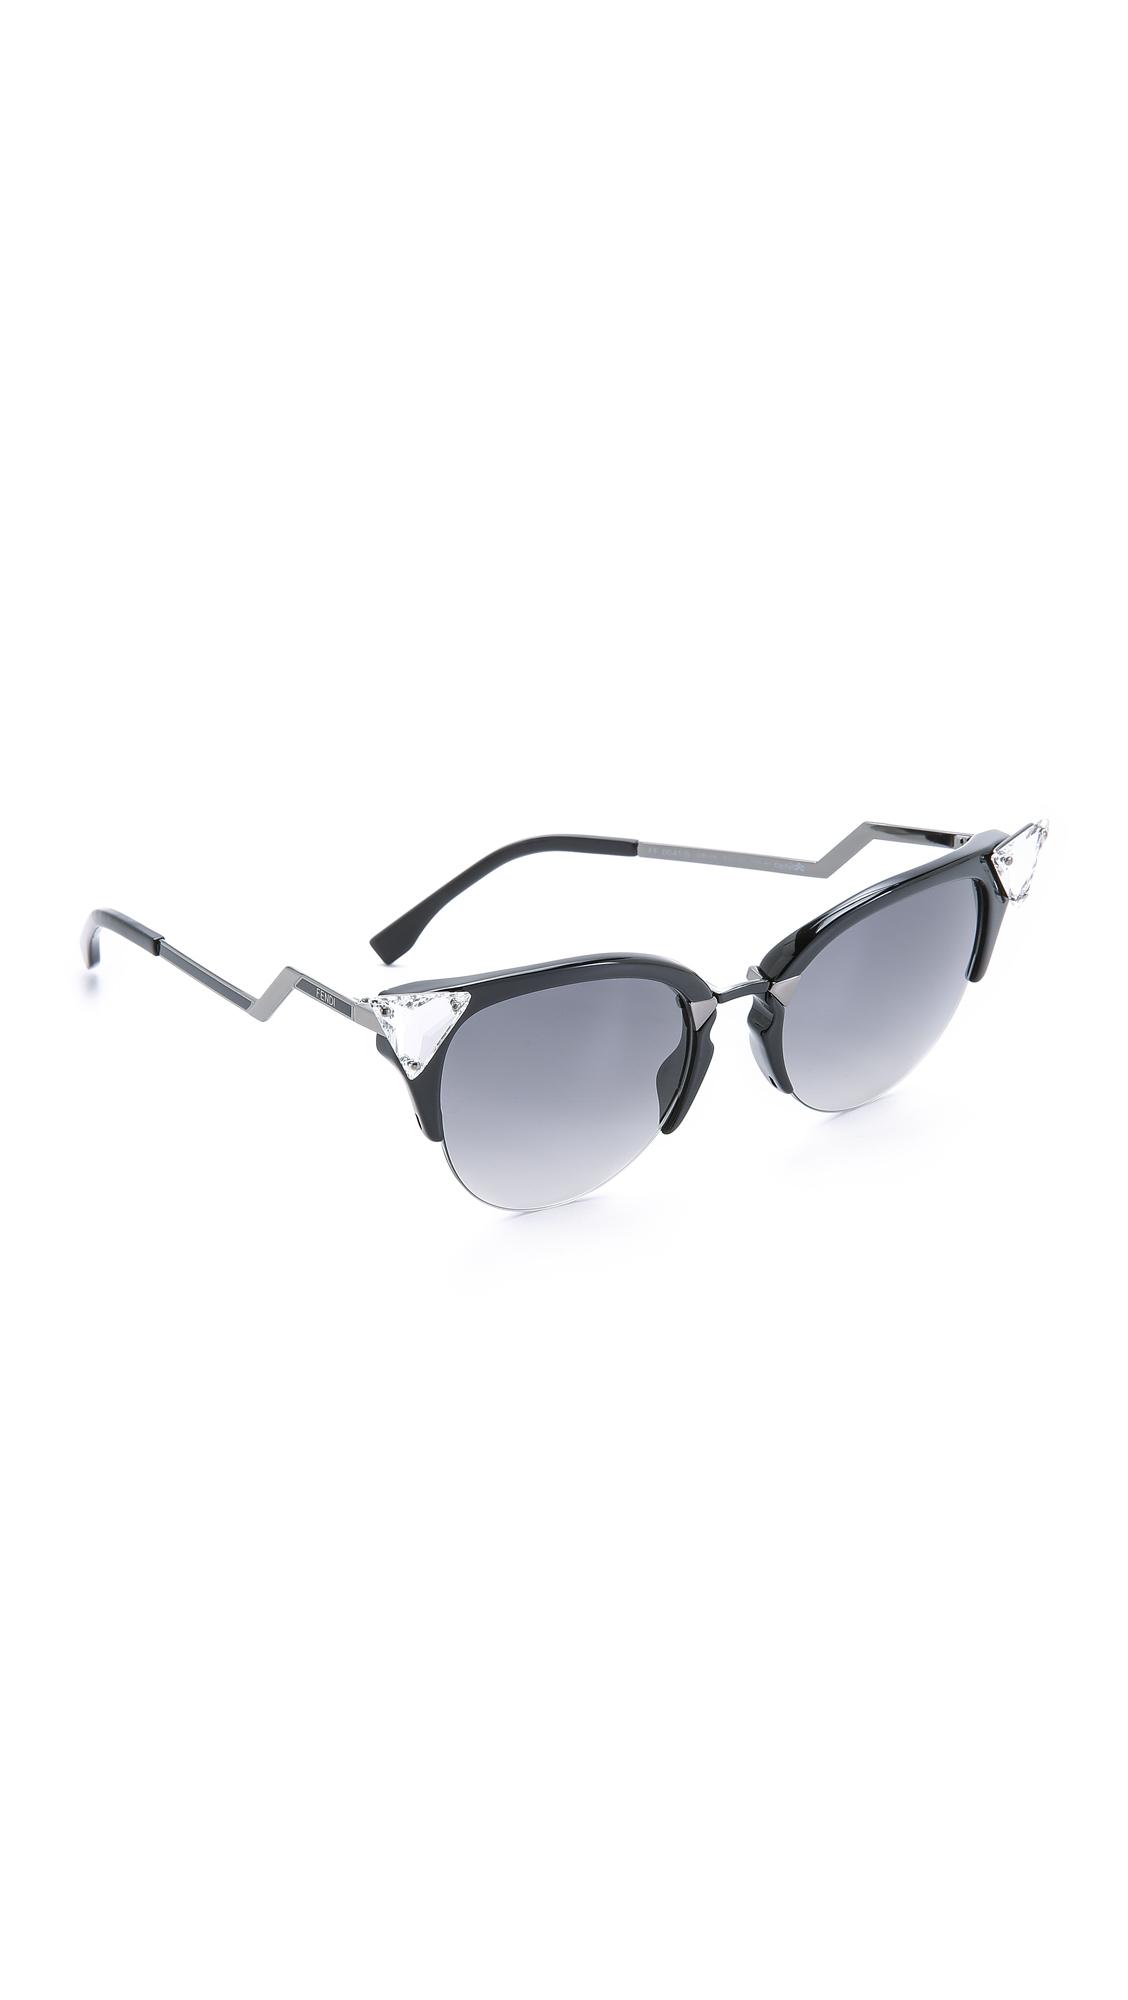 d8215731634 Lyst - Fendi Iridia Crystal Corner Sunglasses in Black